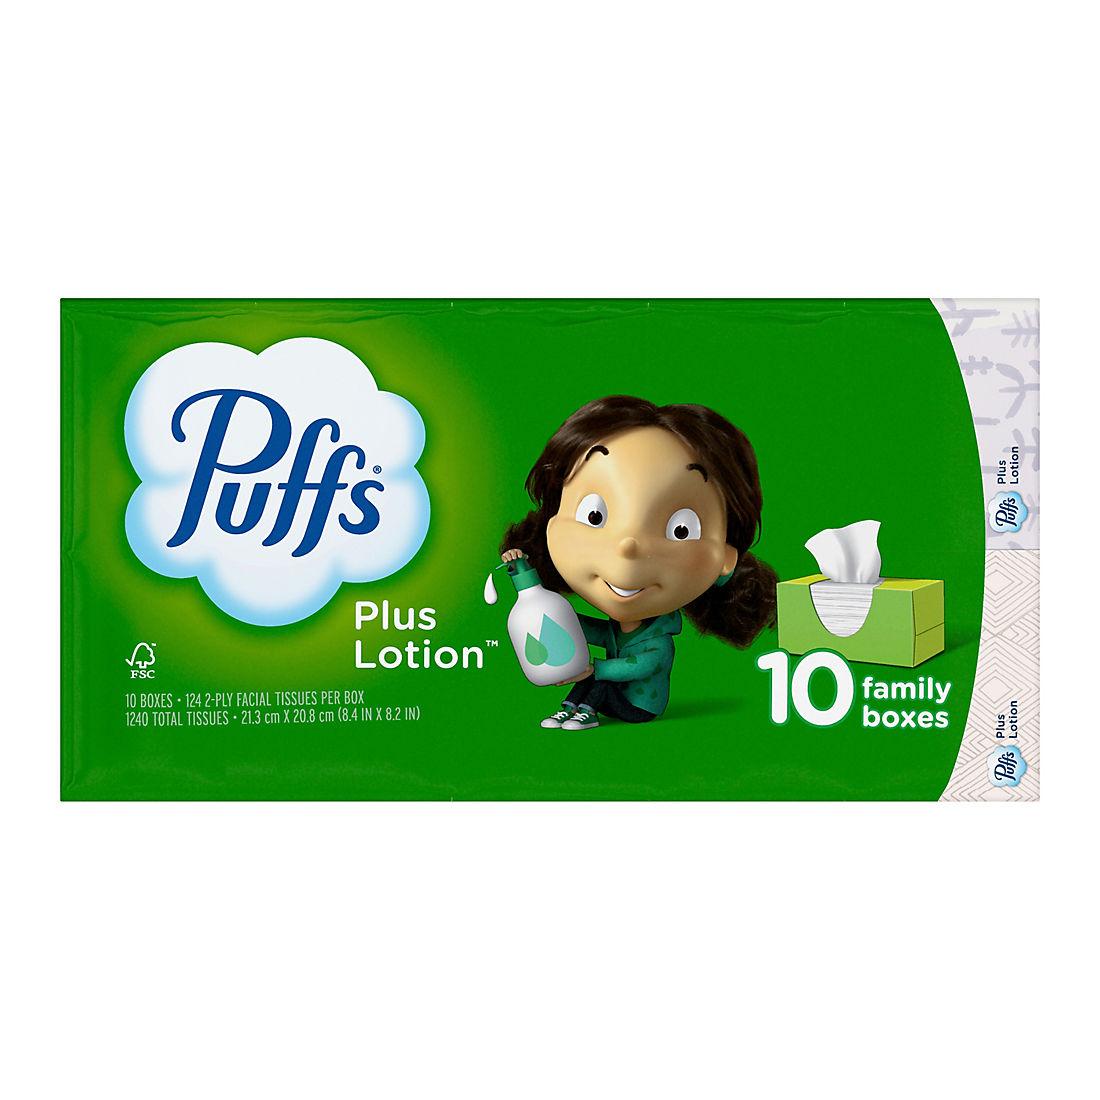 Puffs Plus Lotion Facial Tissues, 1,240 sheets